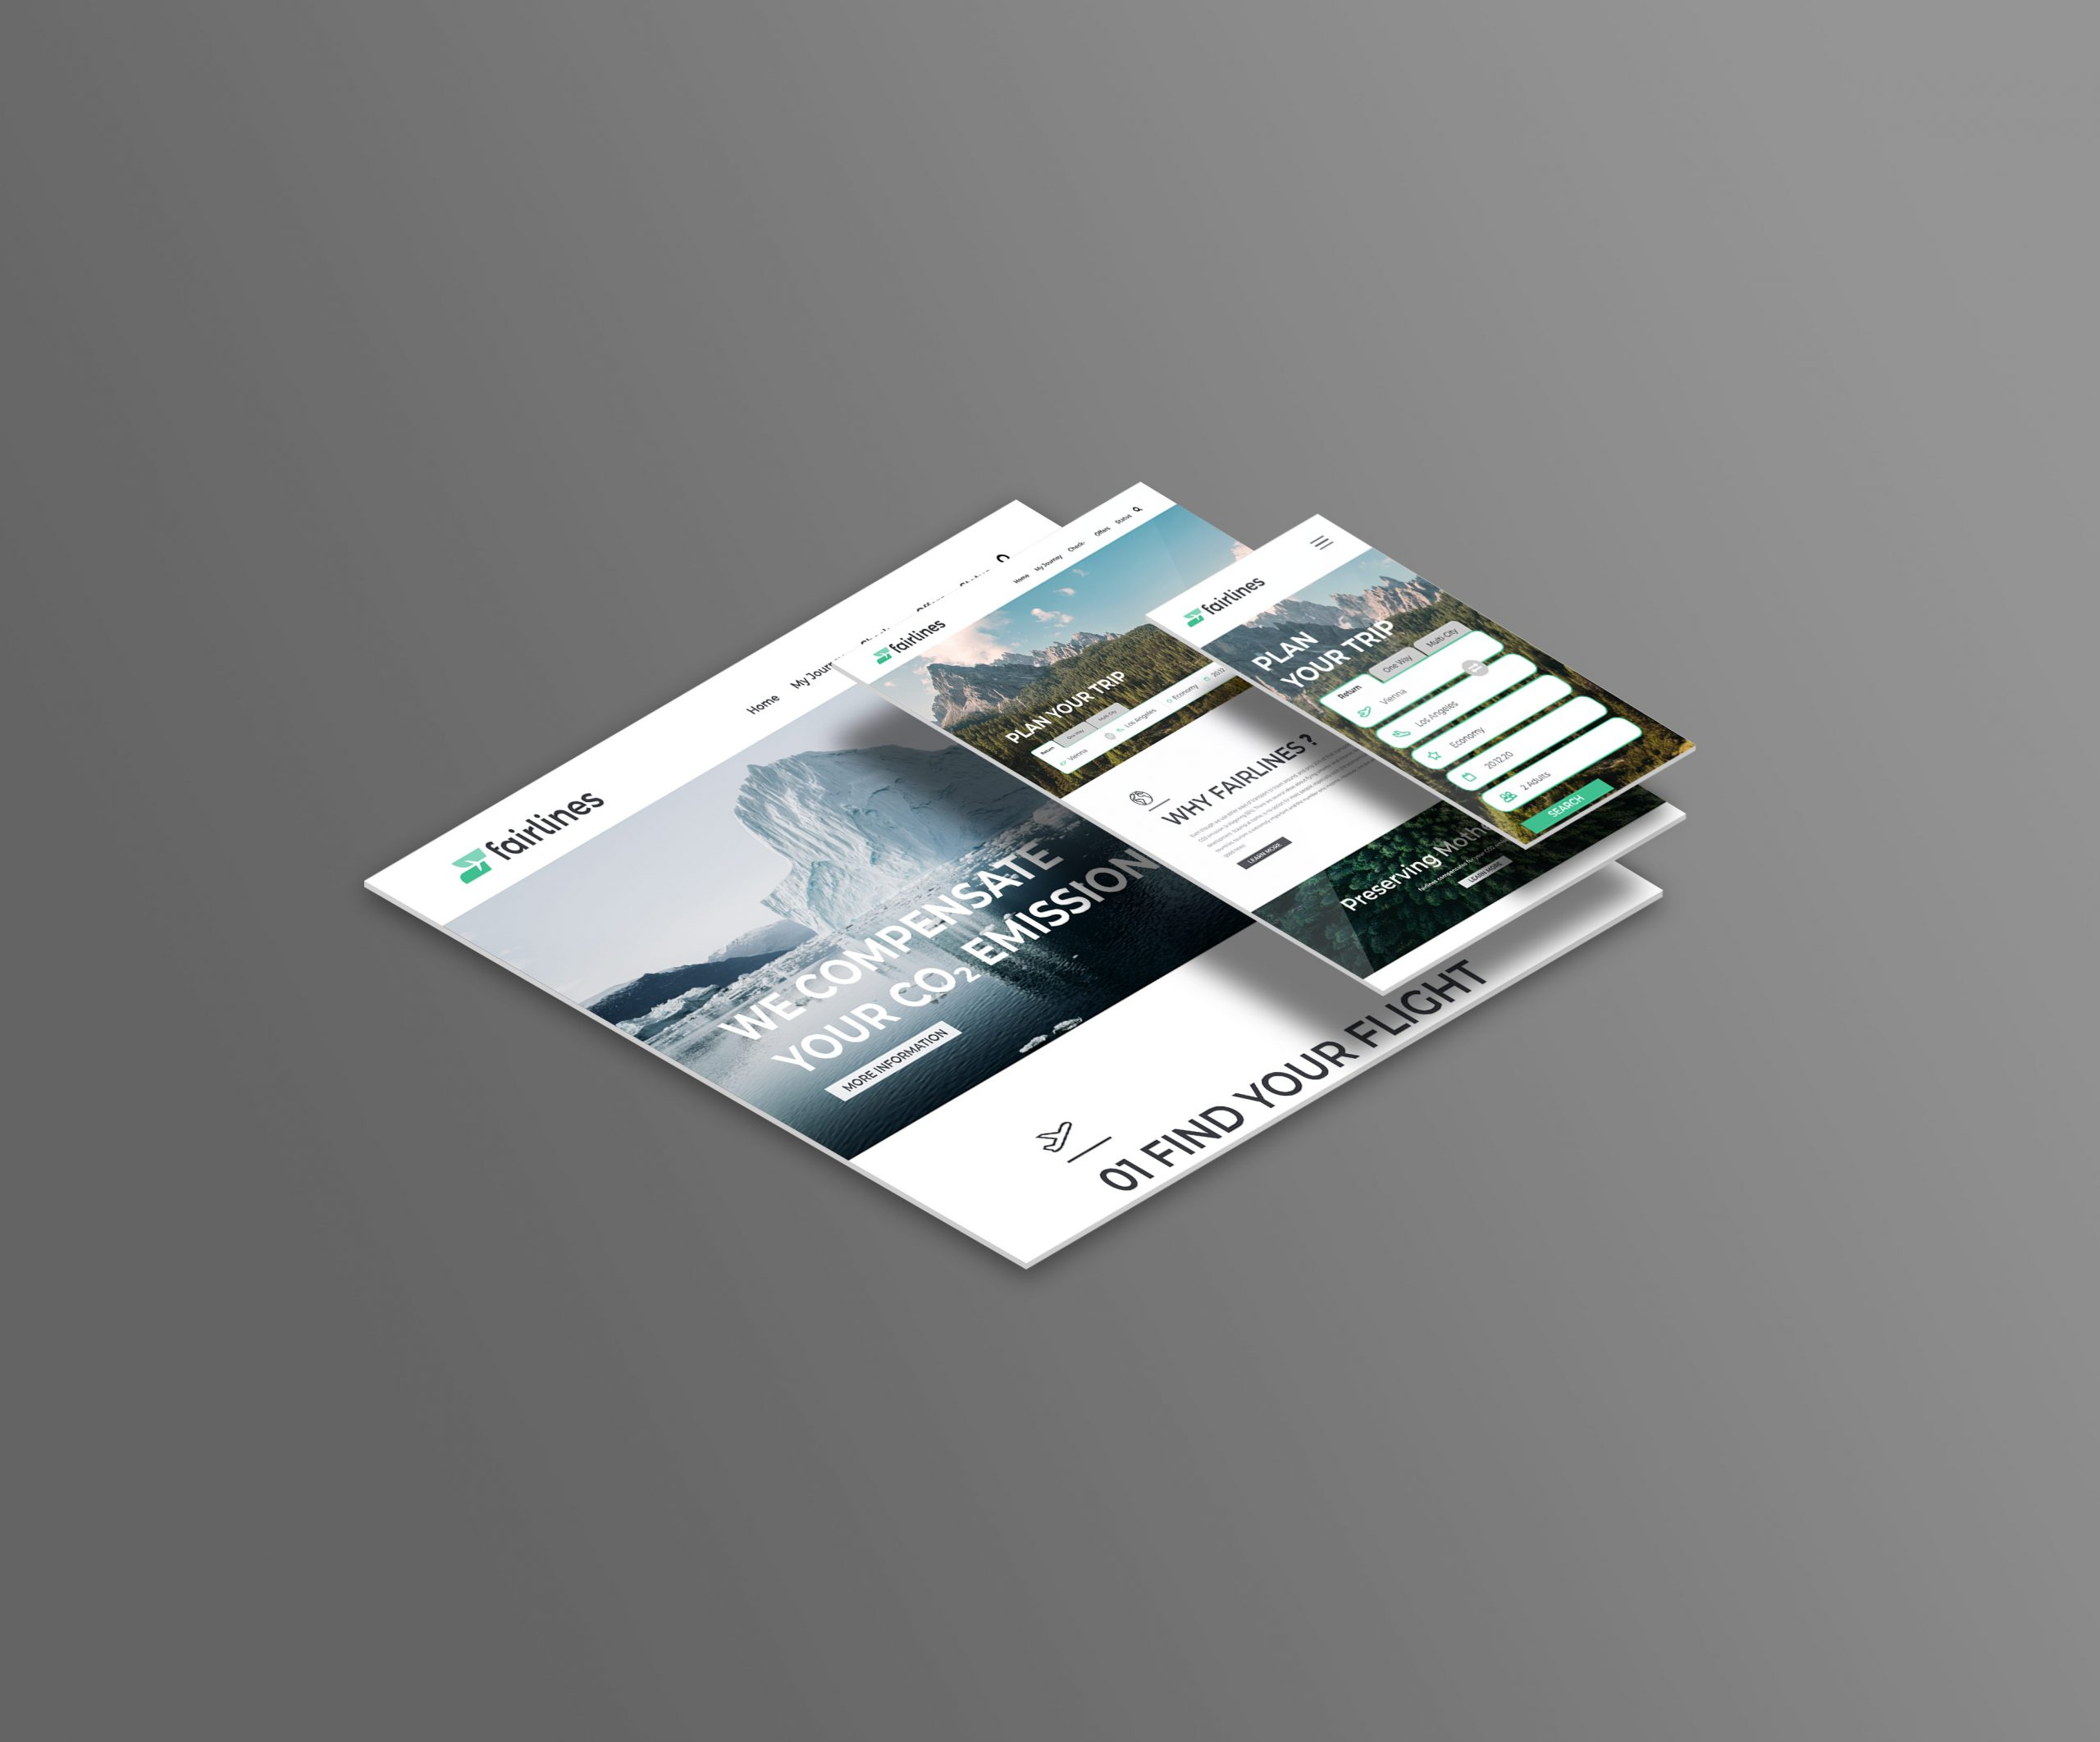 fairlines_webdesign